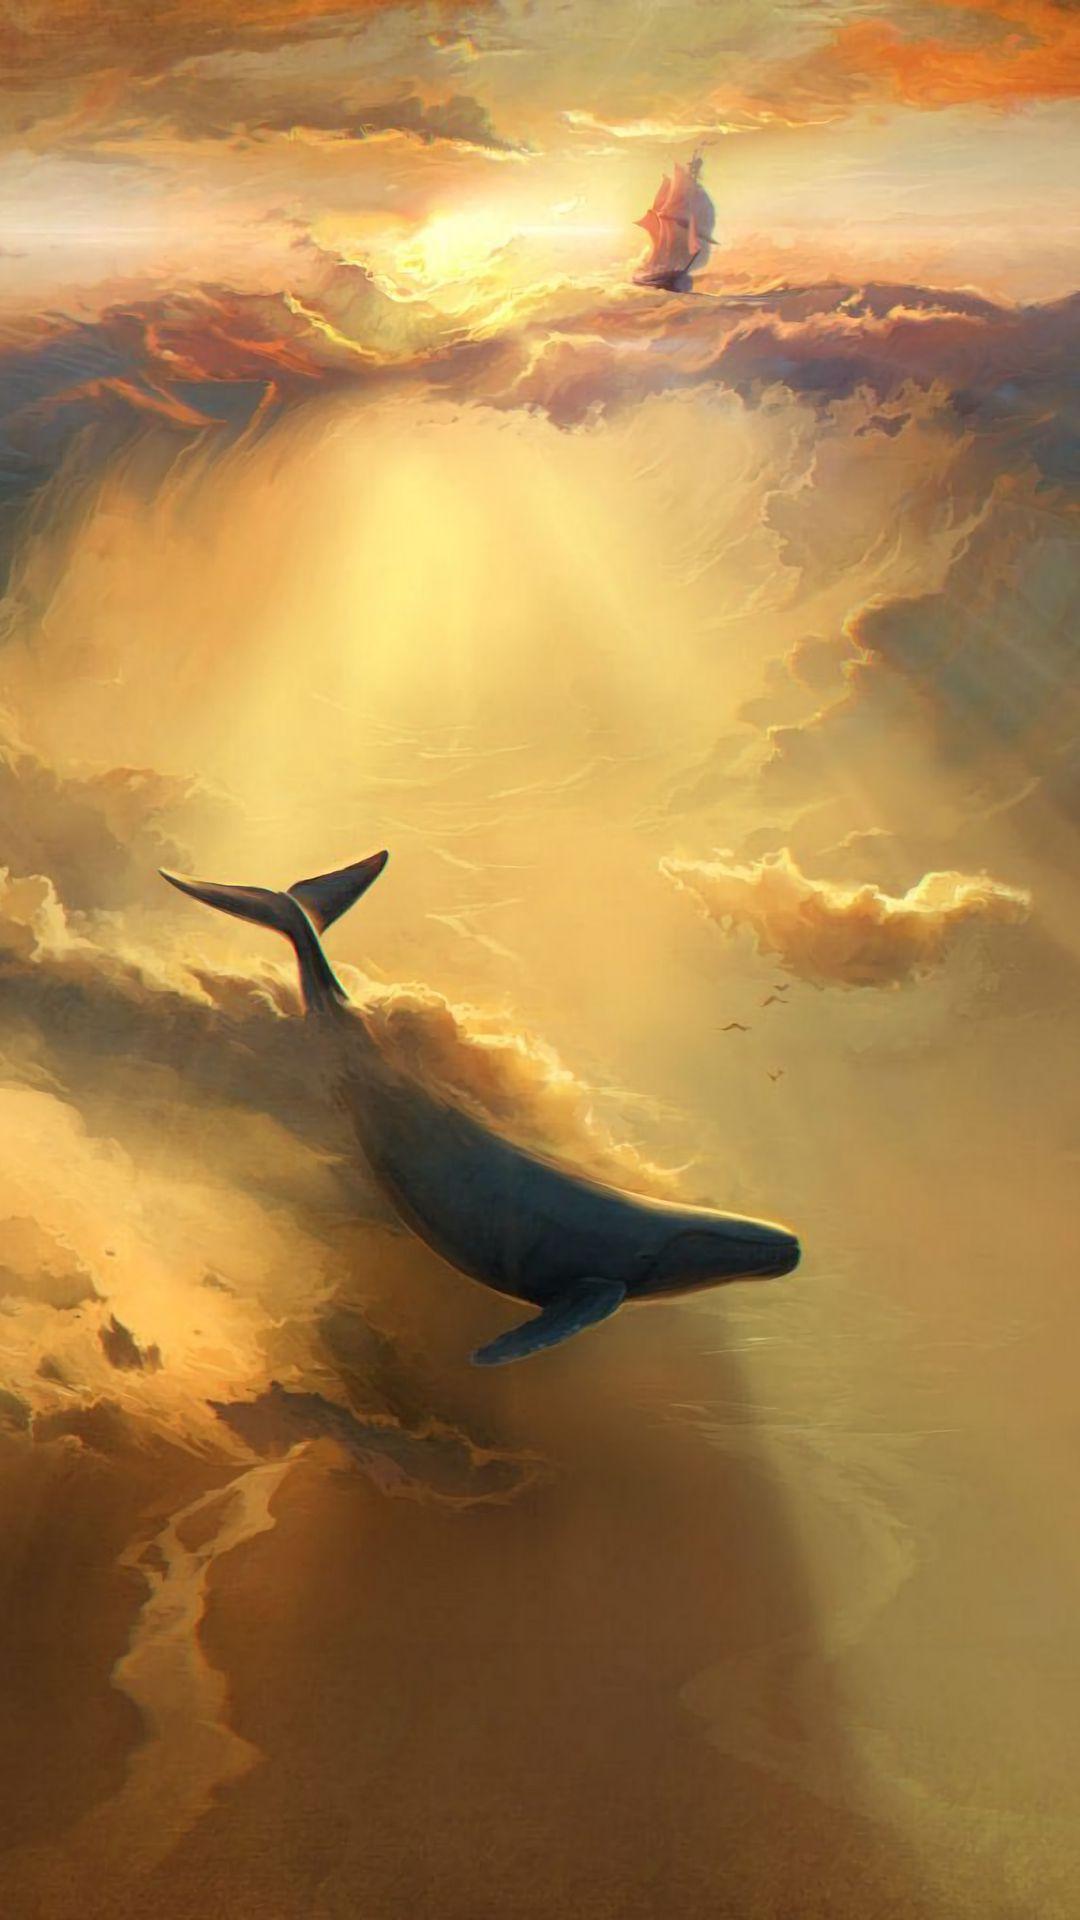 1080x1920 Wallpaper shark, dolphin, sea, art, underwater world